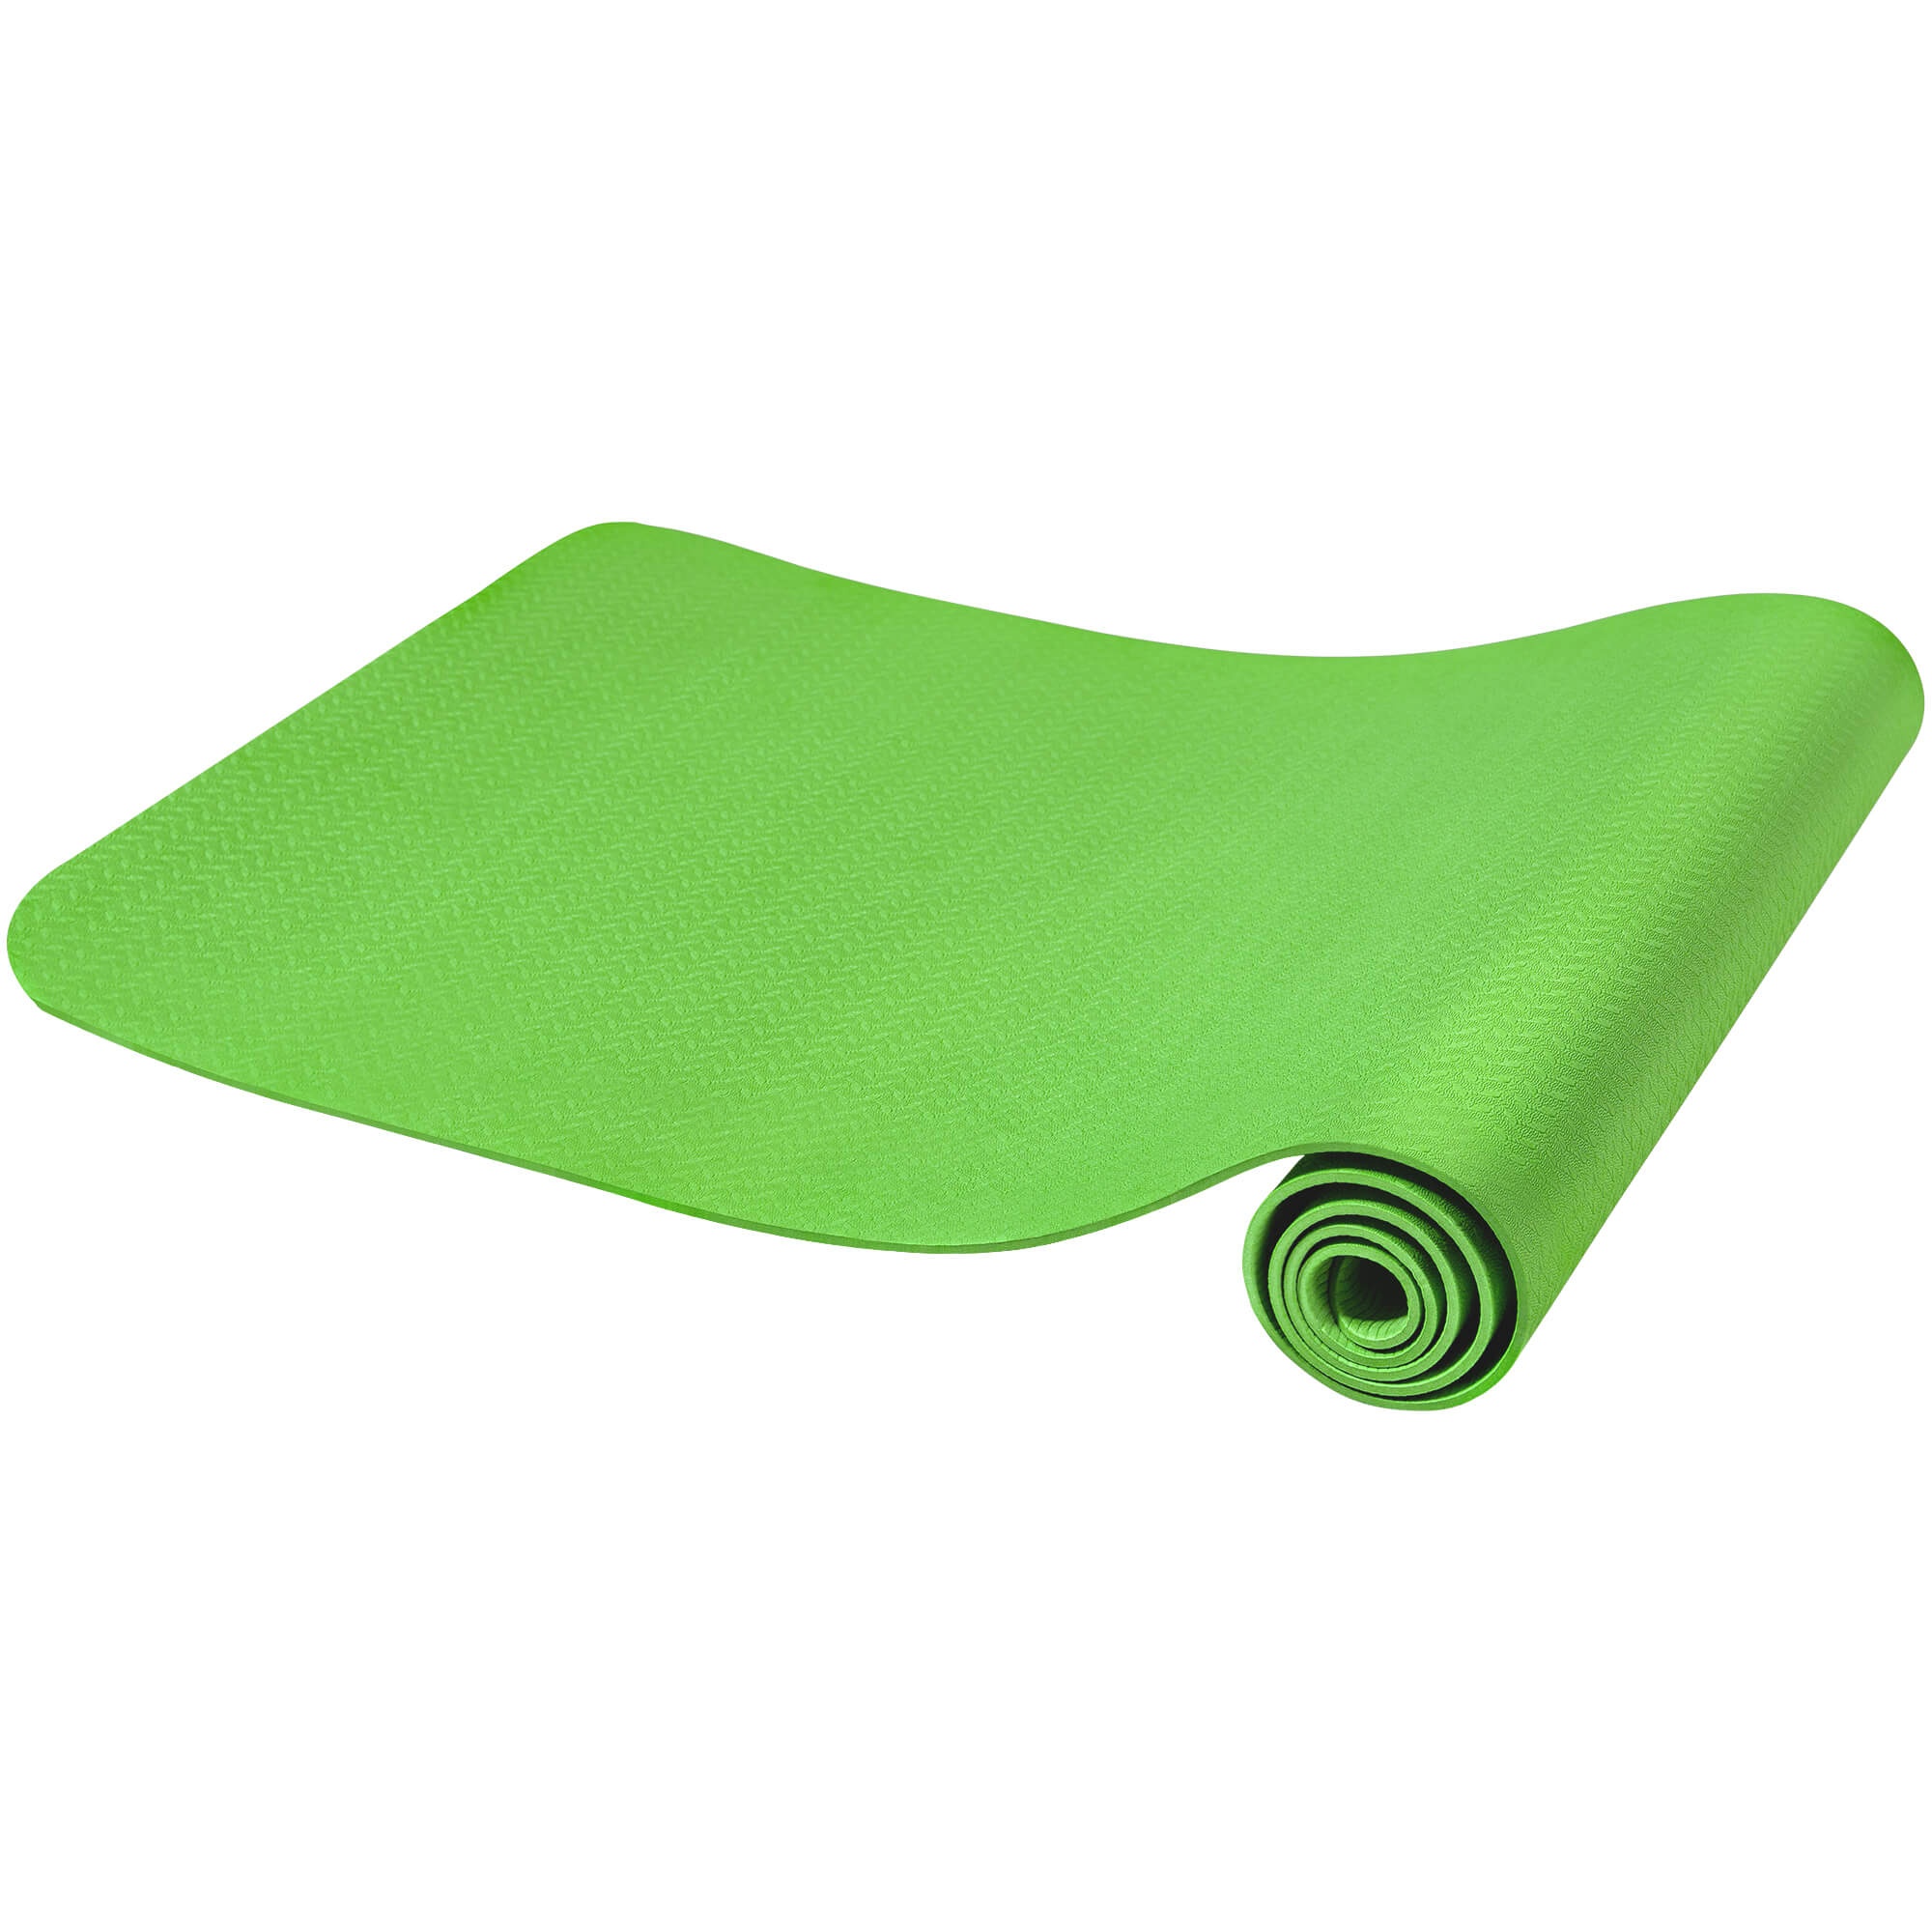 Yogamatte Dünn Limegreen 4 mm